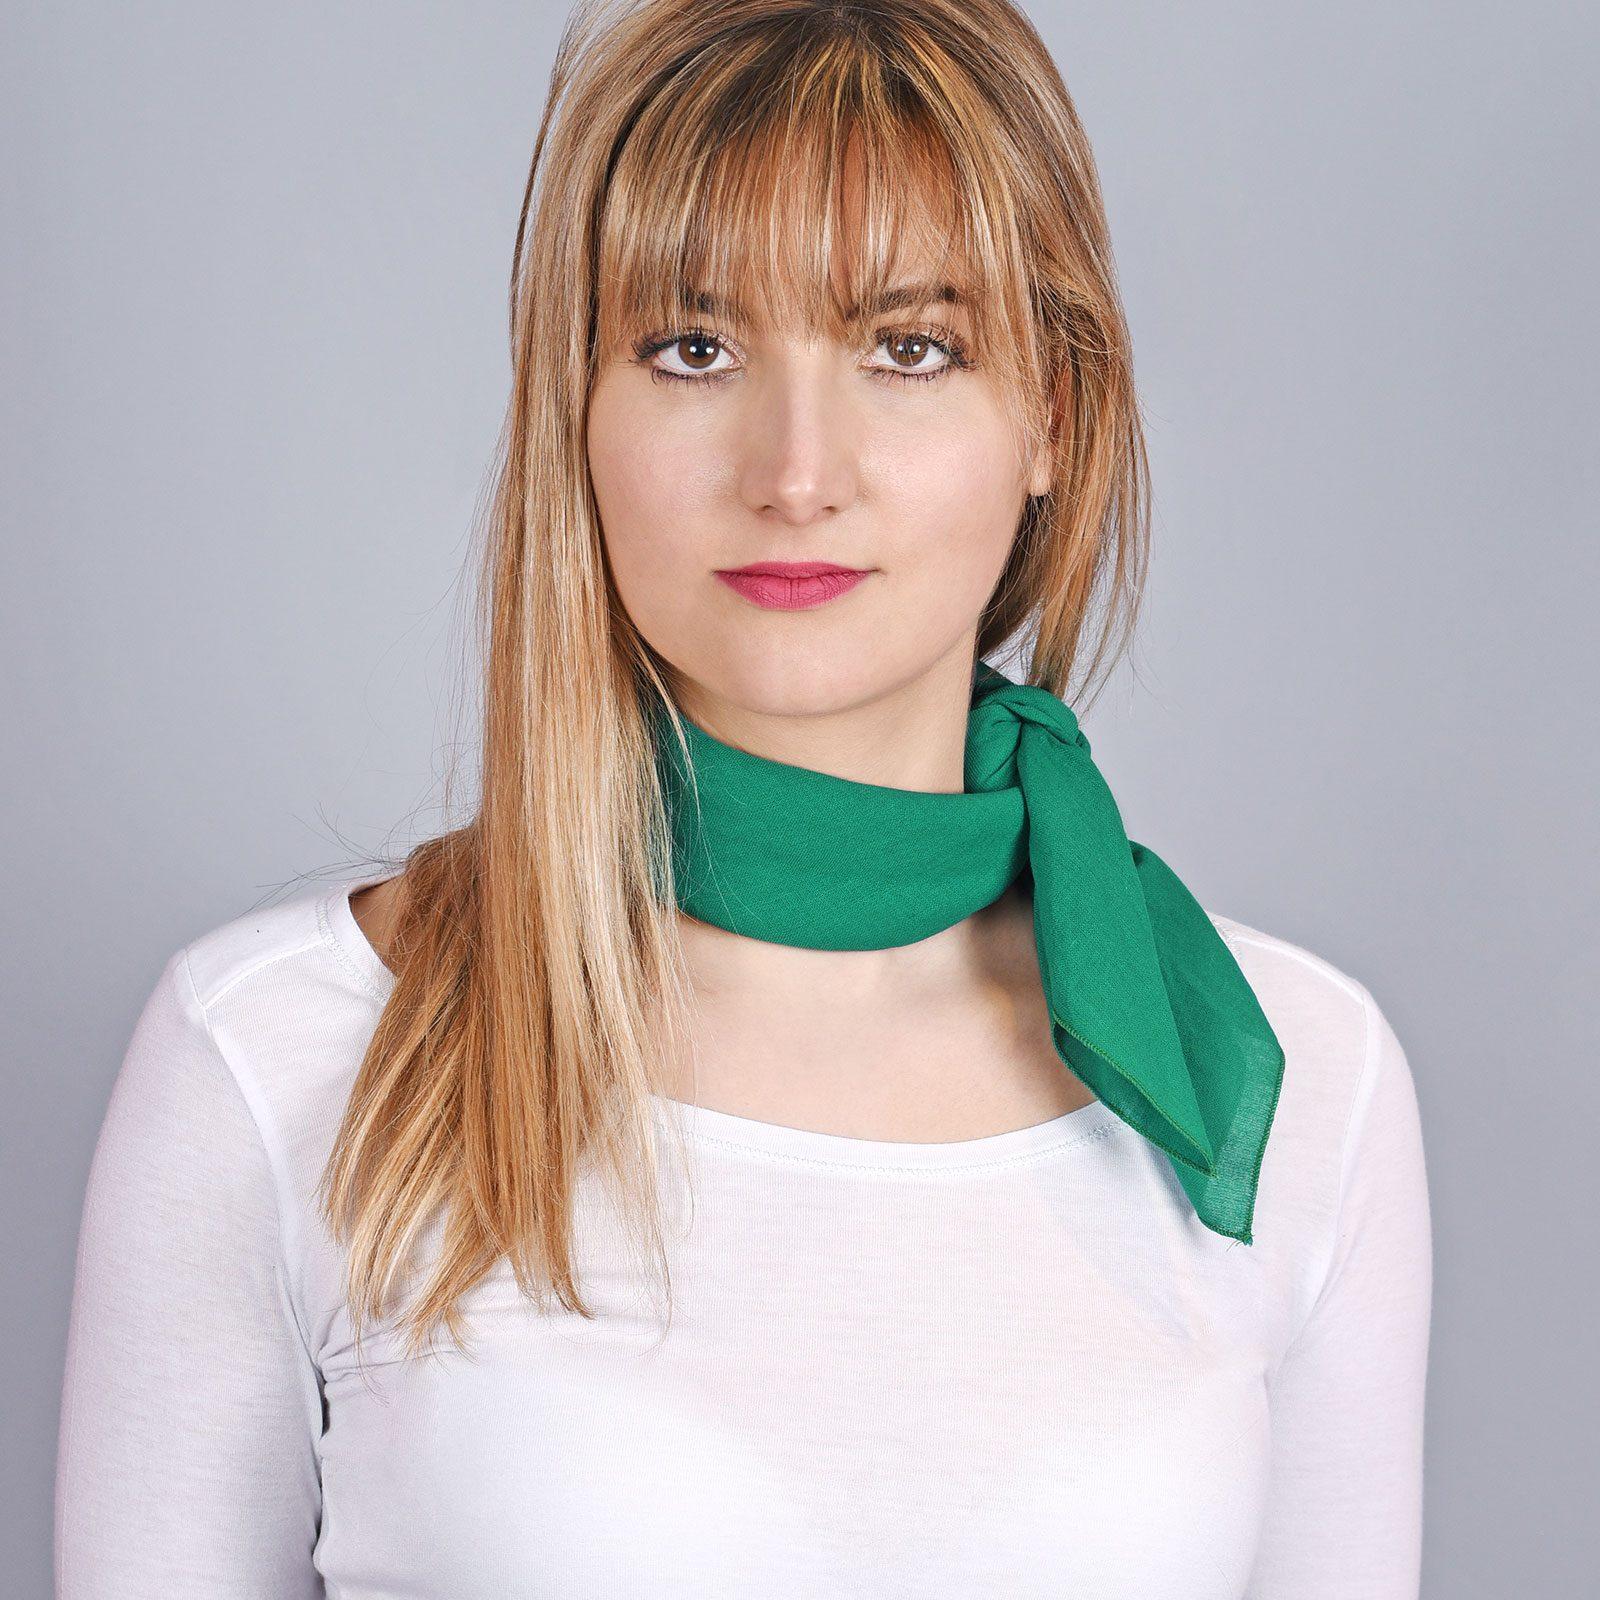 http://lookbook.allee-du-foulard.fr/wp-content/uploads/2018/06/AT-04303-VF16-1-foulard-bandana-vert-uni-1600x1600.jpg